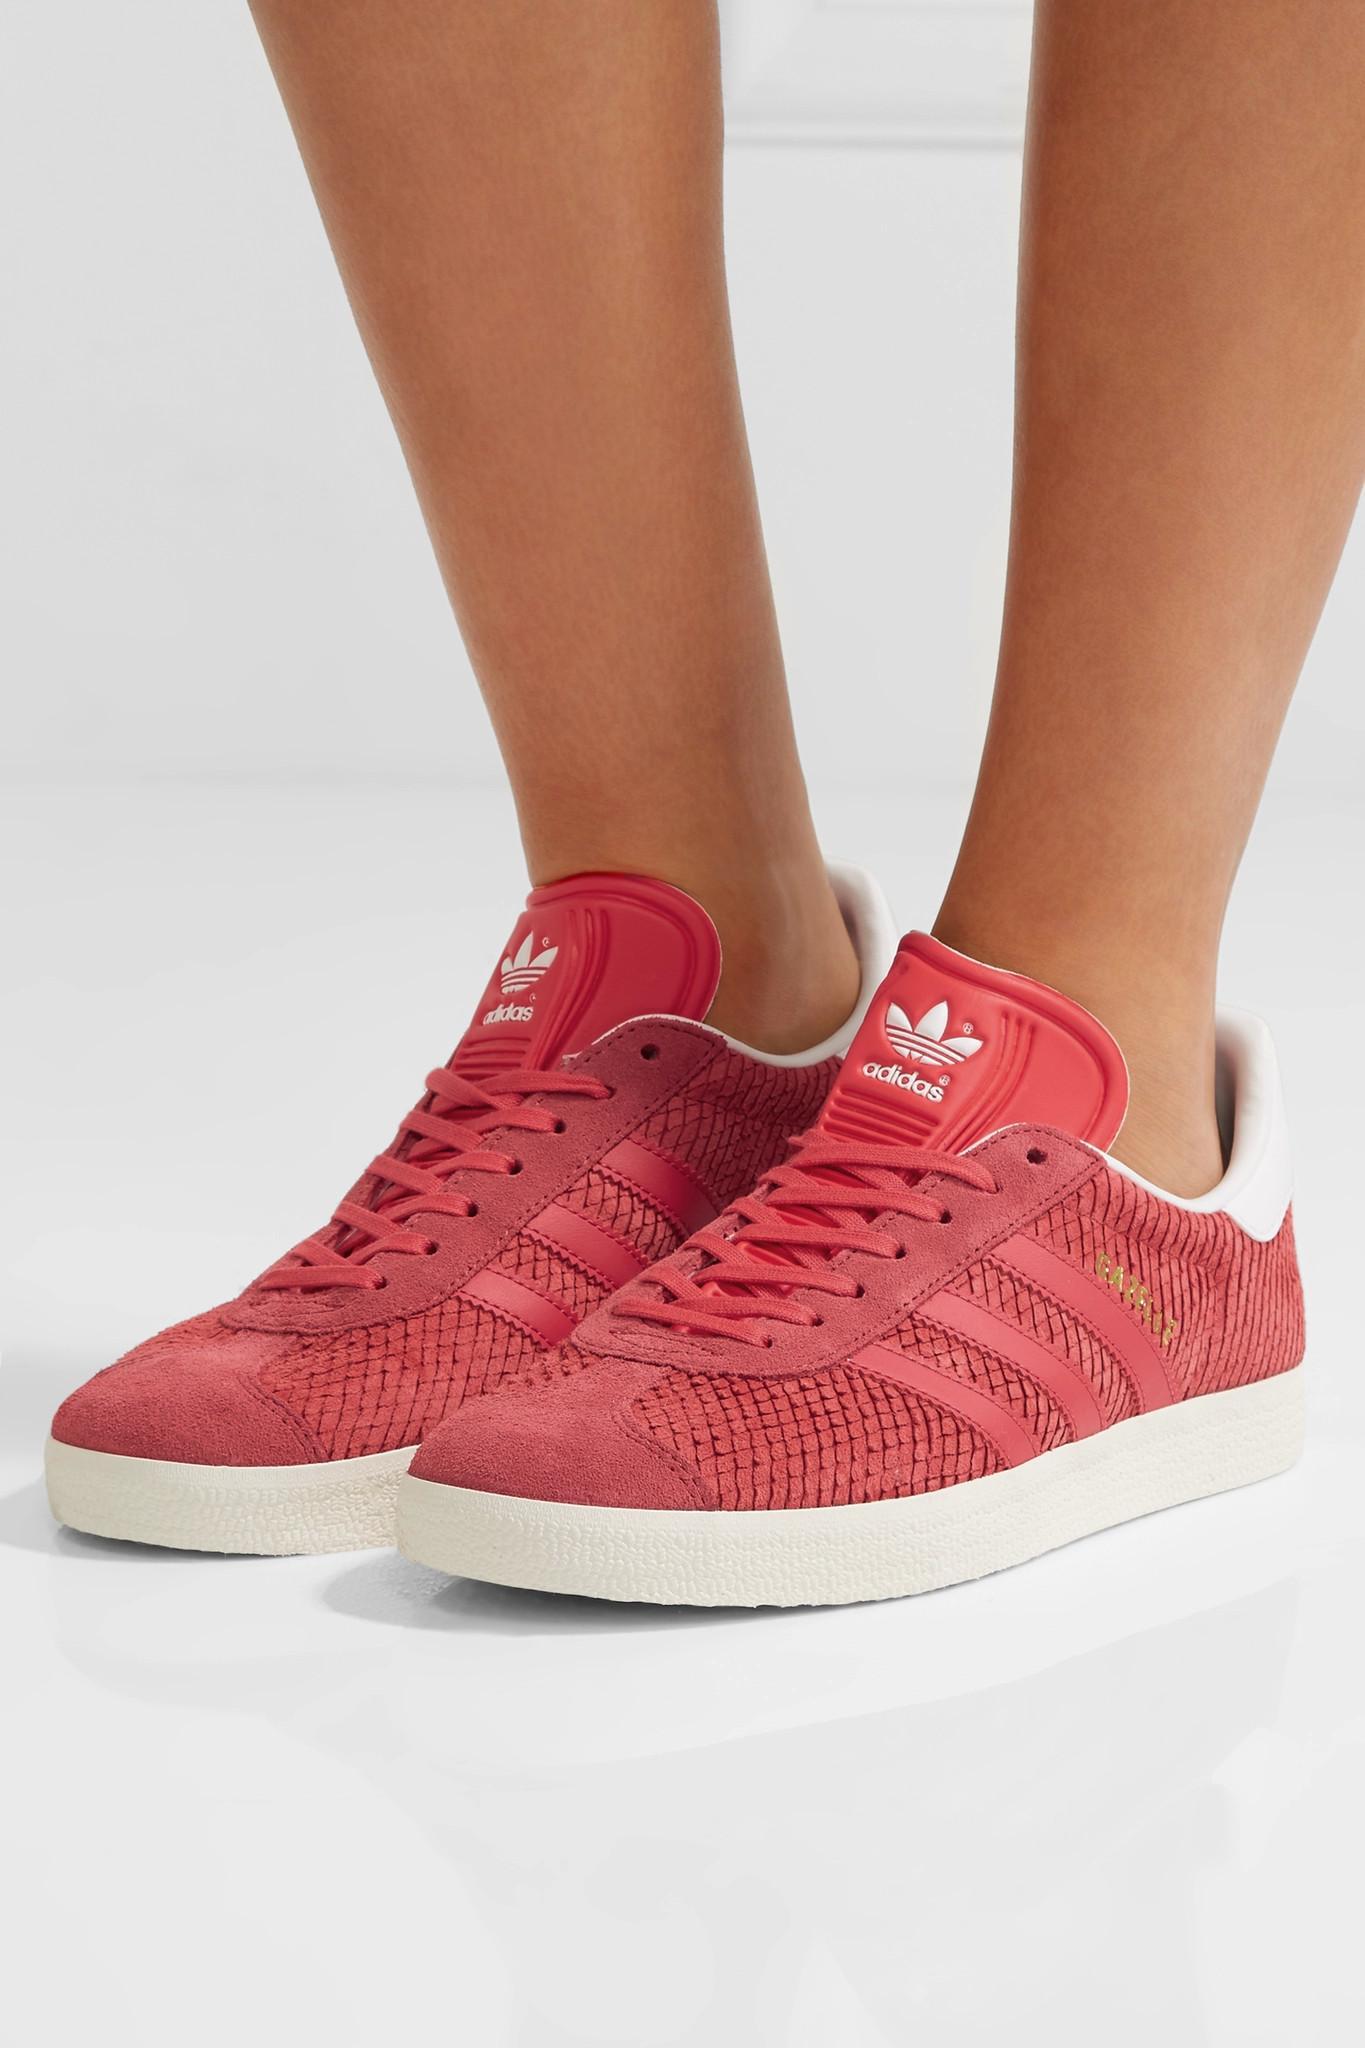 d2de01177fe7 Lyst - adidas Originals Gazelle Leather-trimmed Snake-effect Suede ...